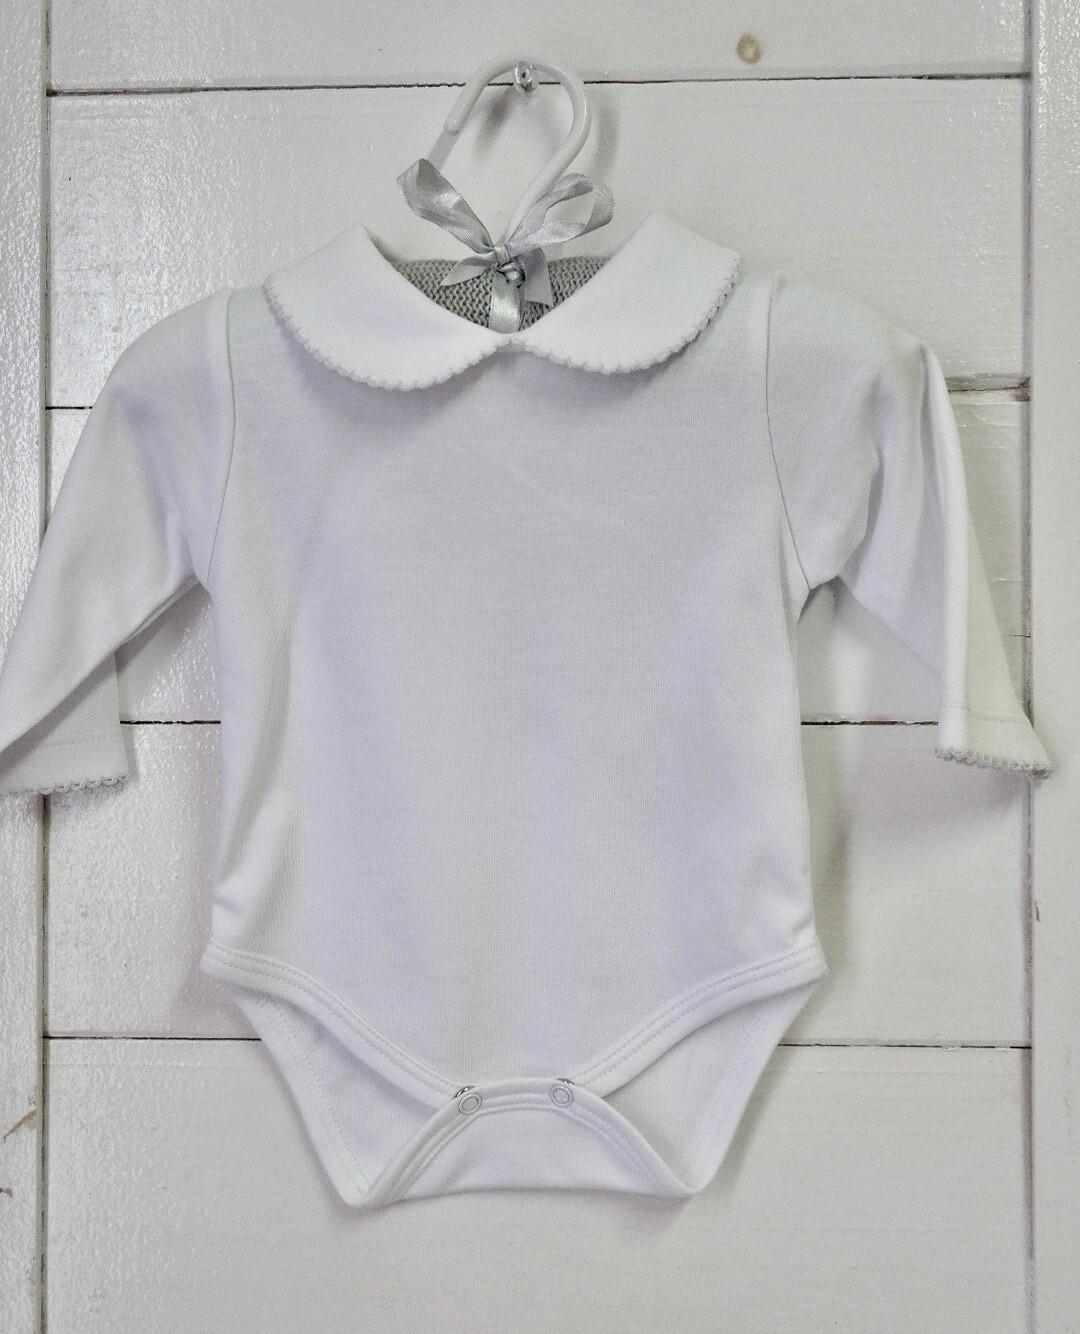 Long Sleeve Body Suit w/ Bebe Collar White 0-3 mos